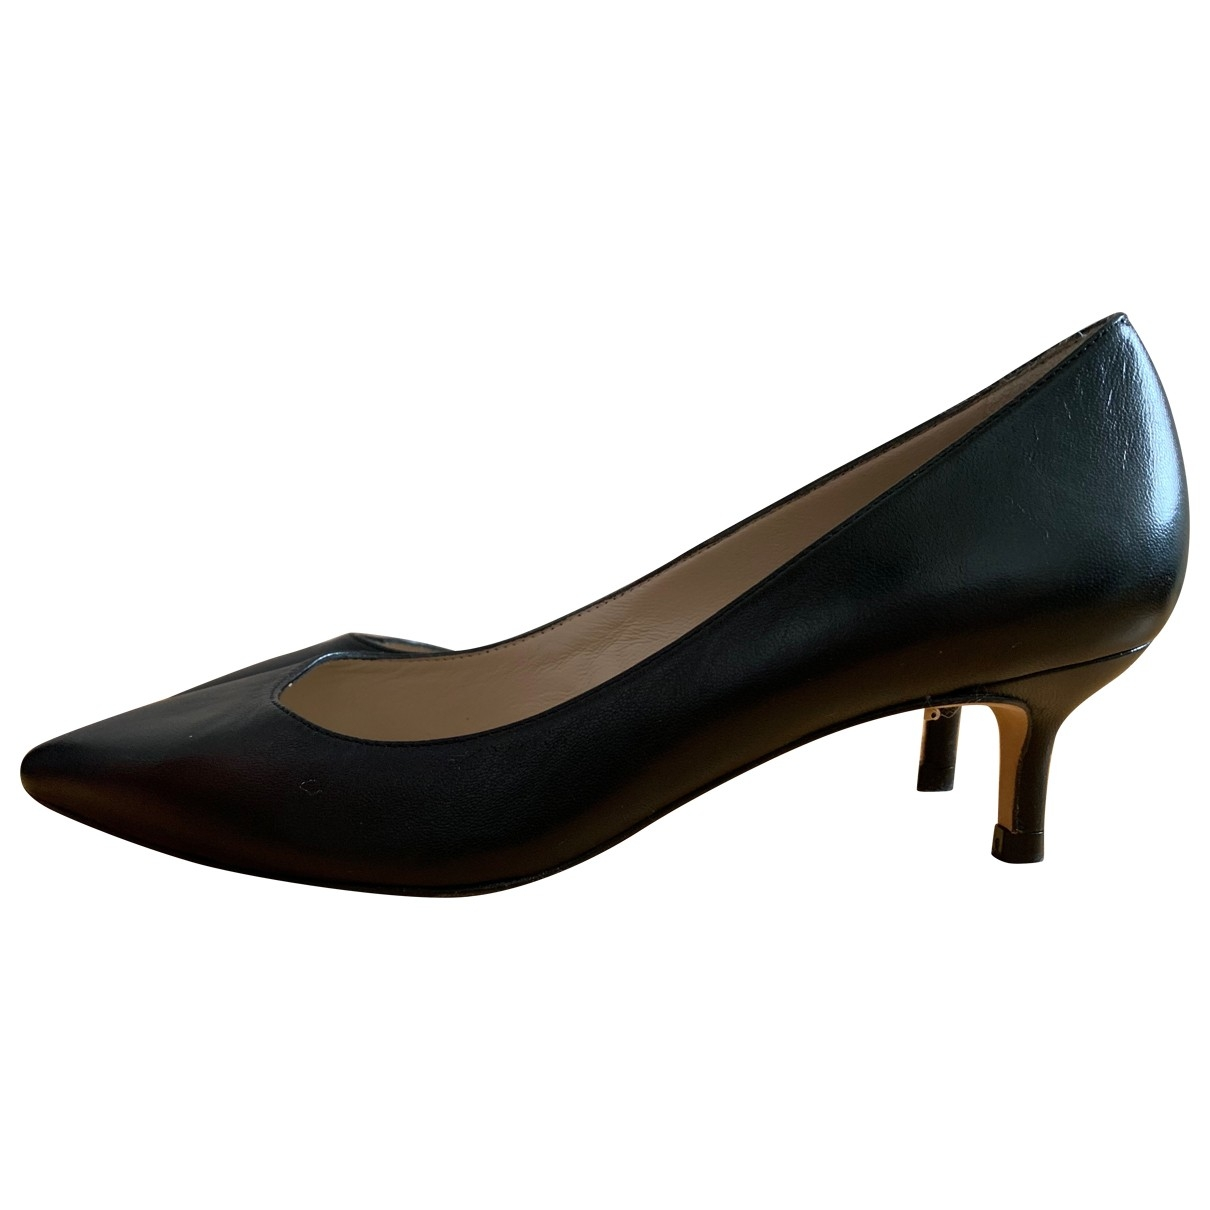 Lk Bennett \N Black Leather Heels for Women 37 EU